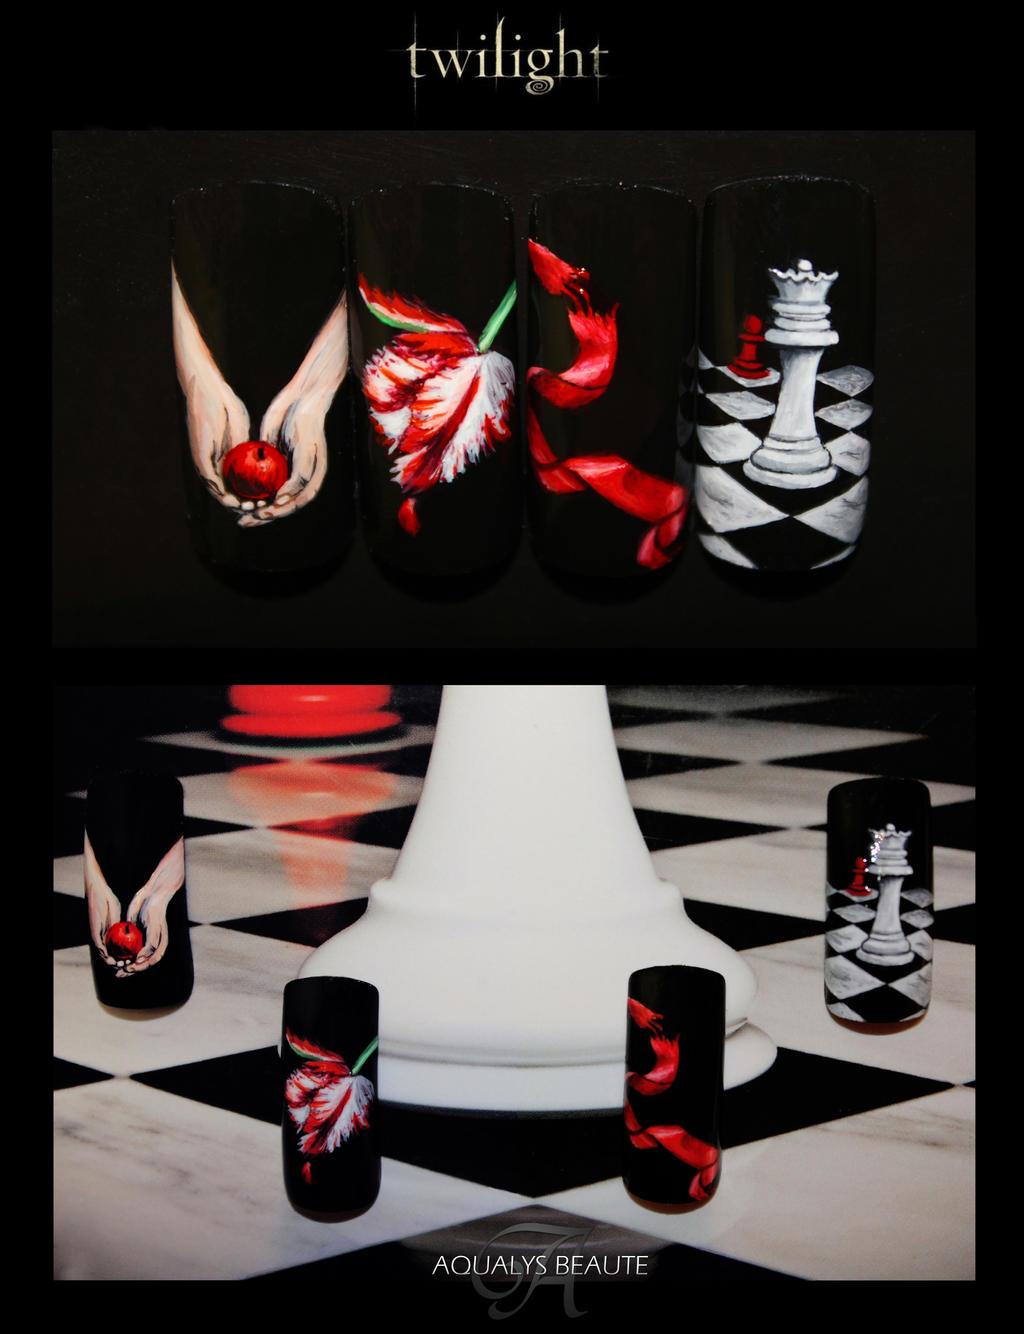 Twilight nails by shangarra on deviantart twilight nails by shangarra twilight nails by shangarra prinsesfo Gallery